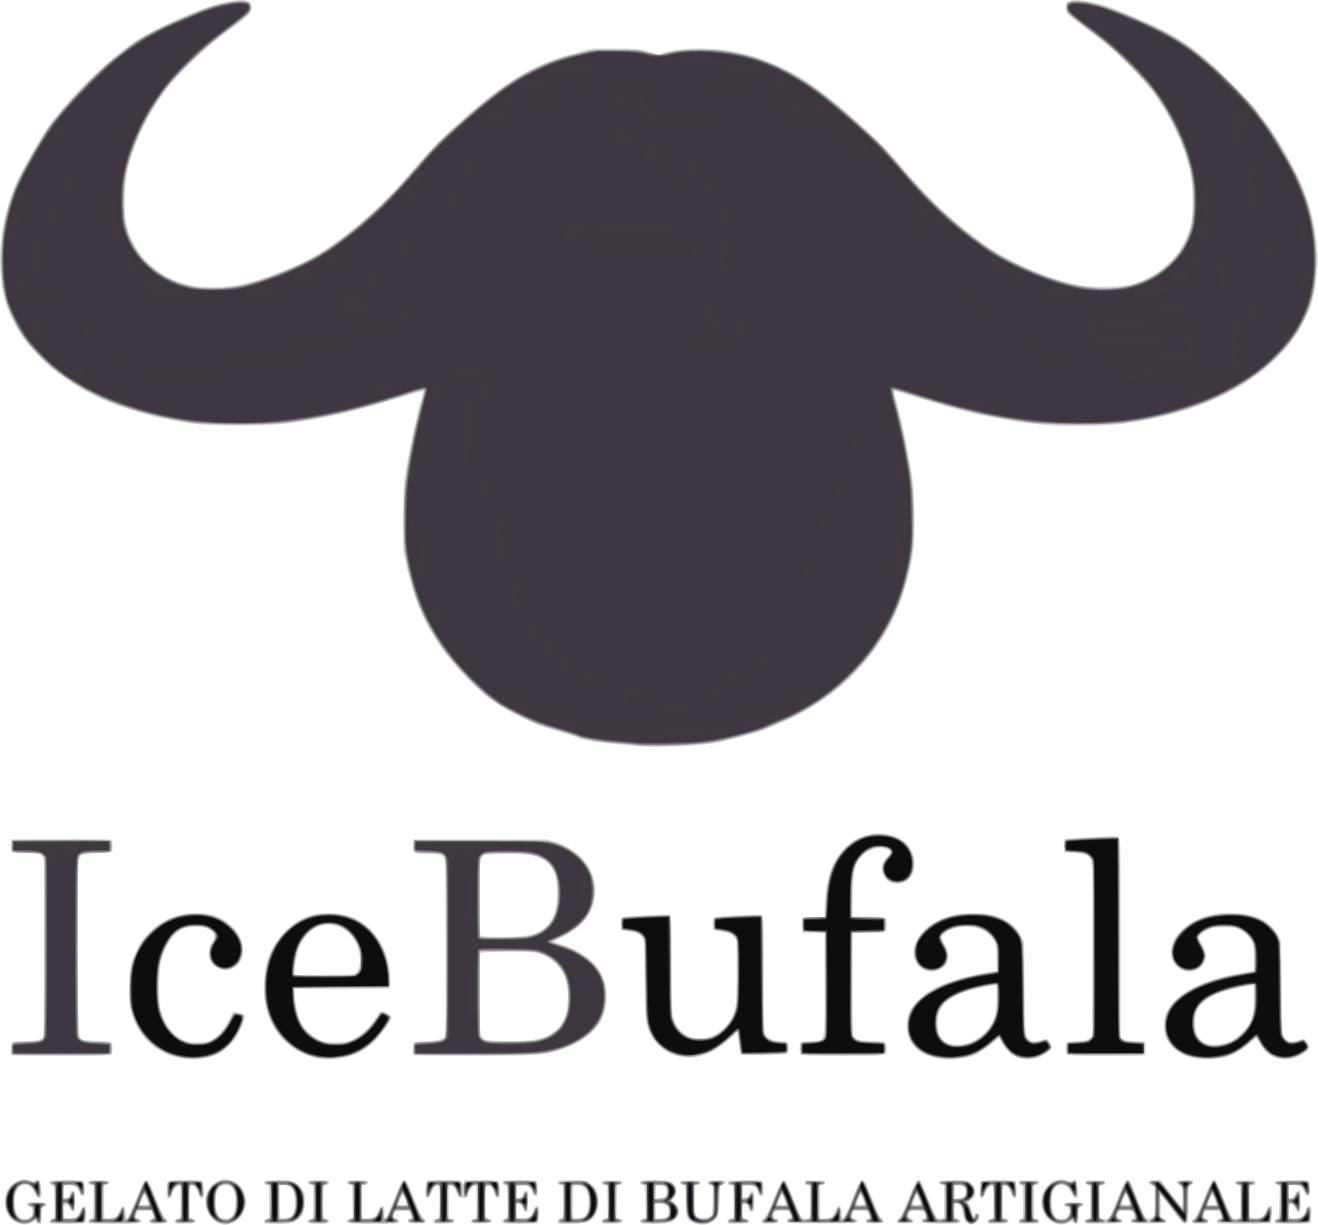 icebufala-gelato-di-latte-di-bufala-artigianale.png